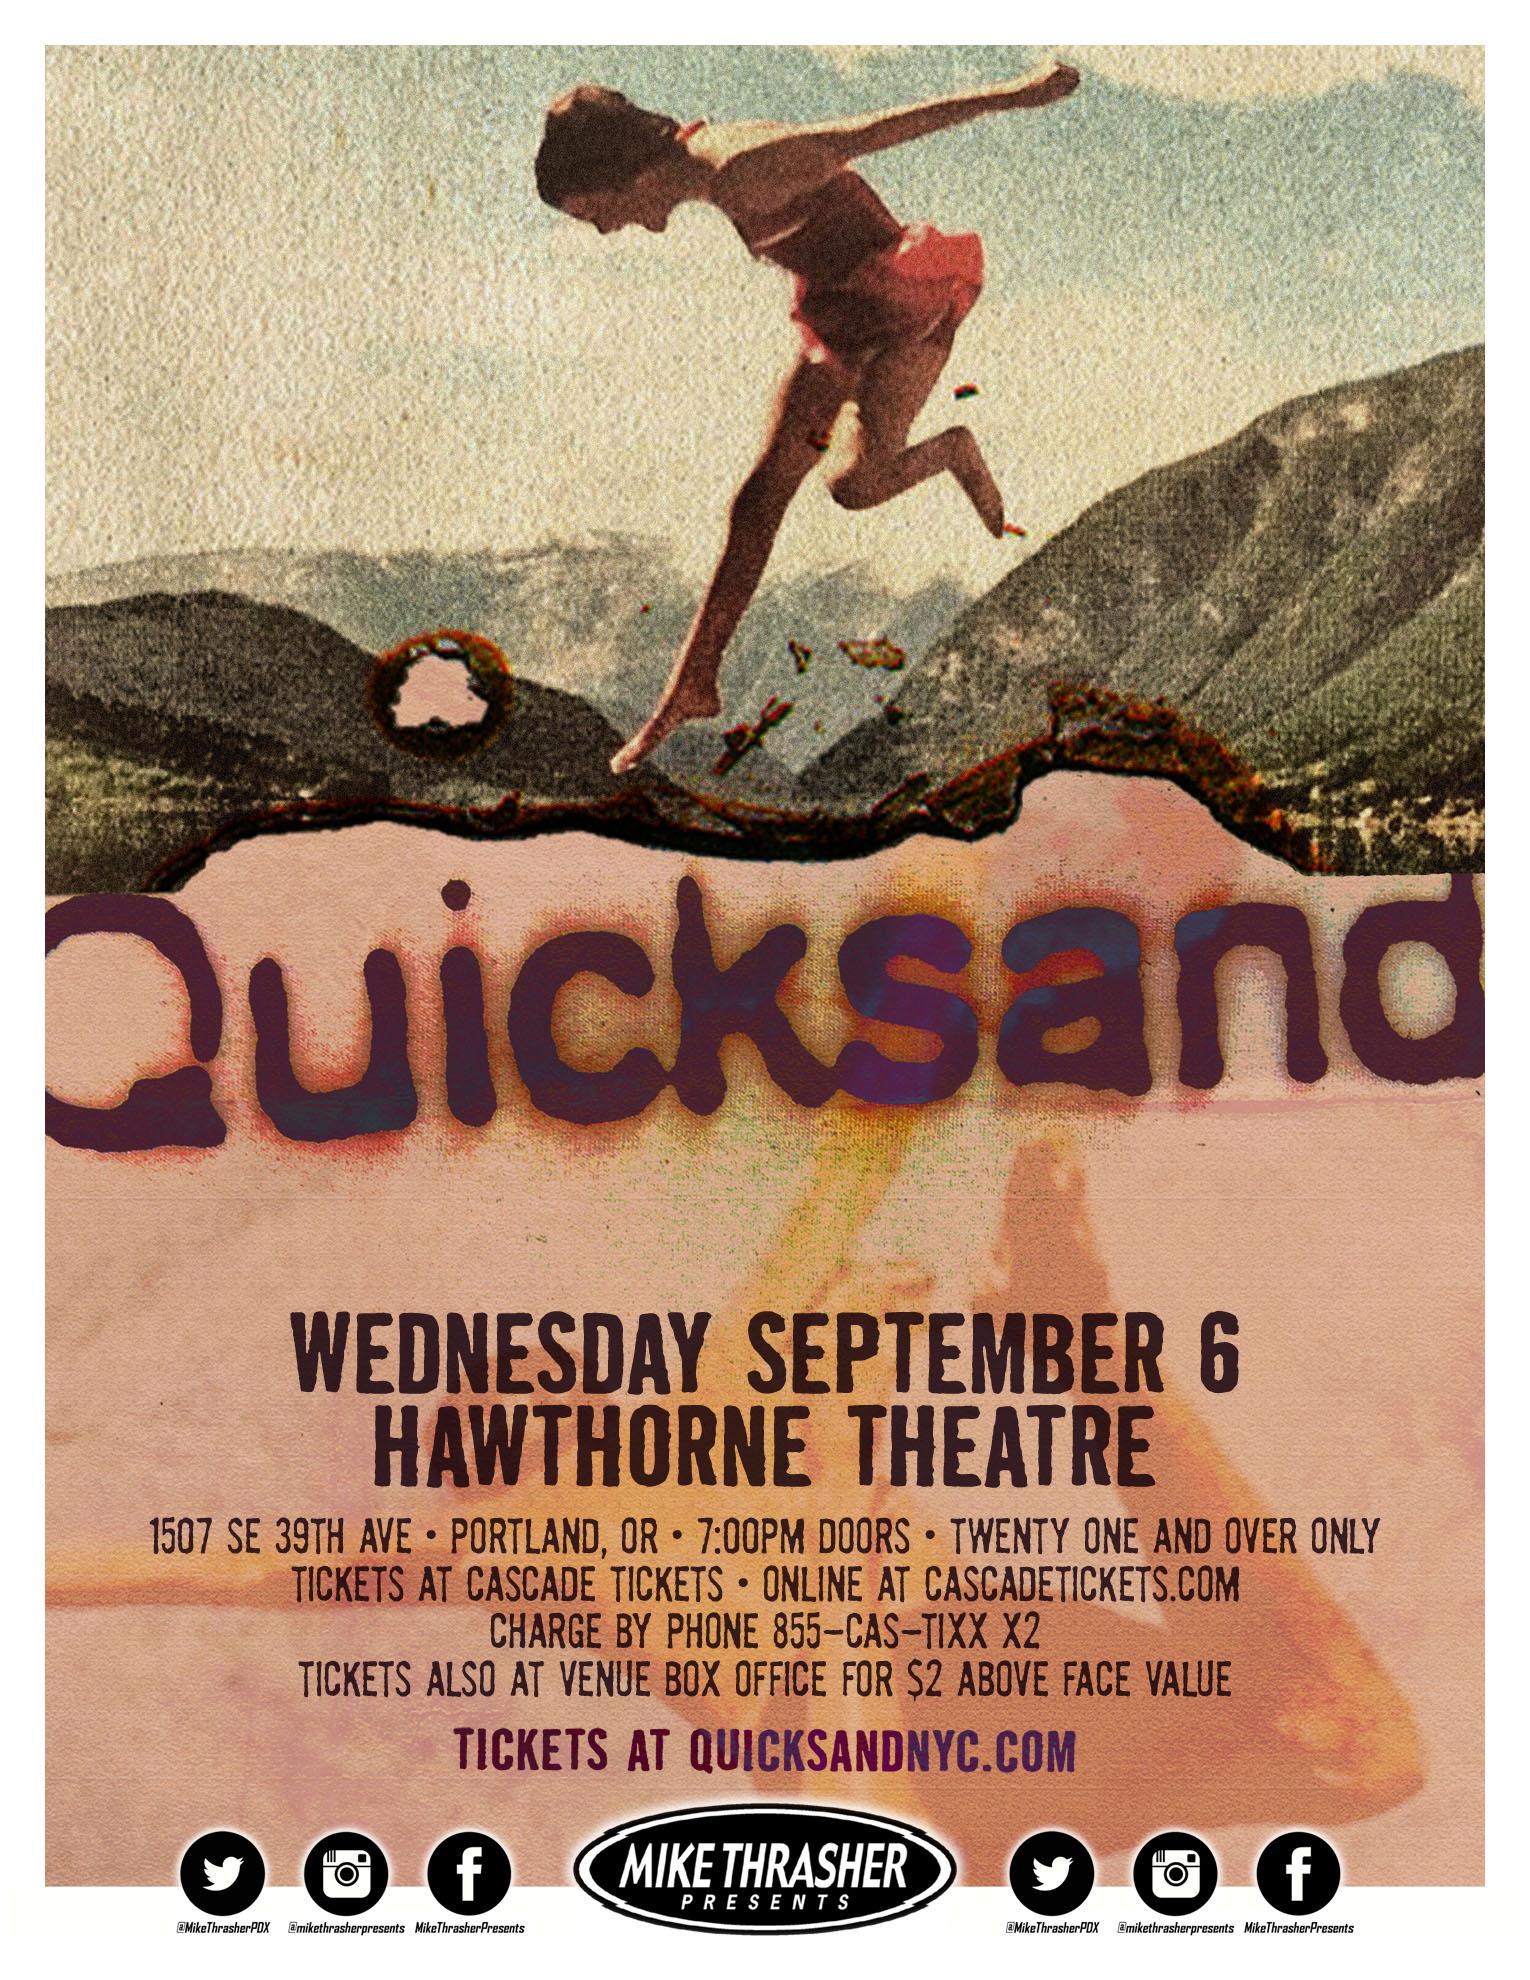 QuicksandPDXsept17